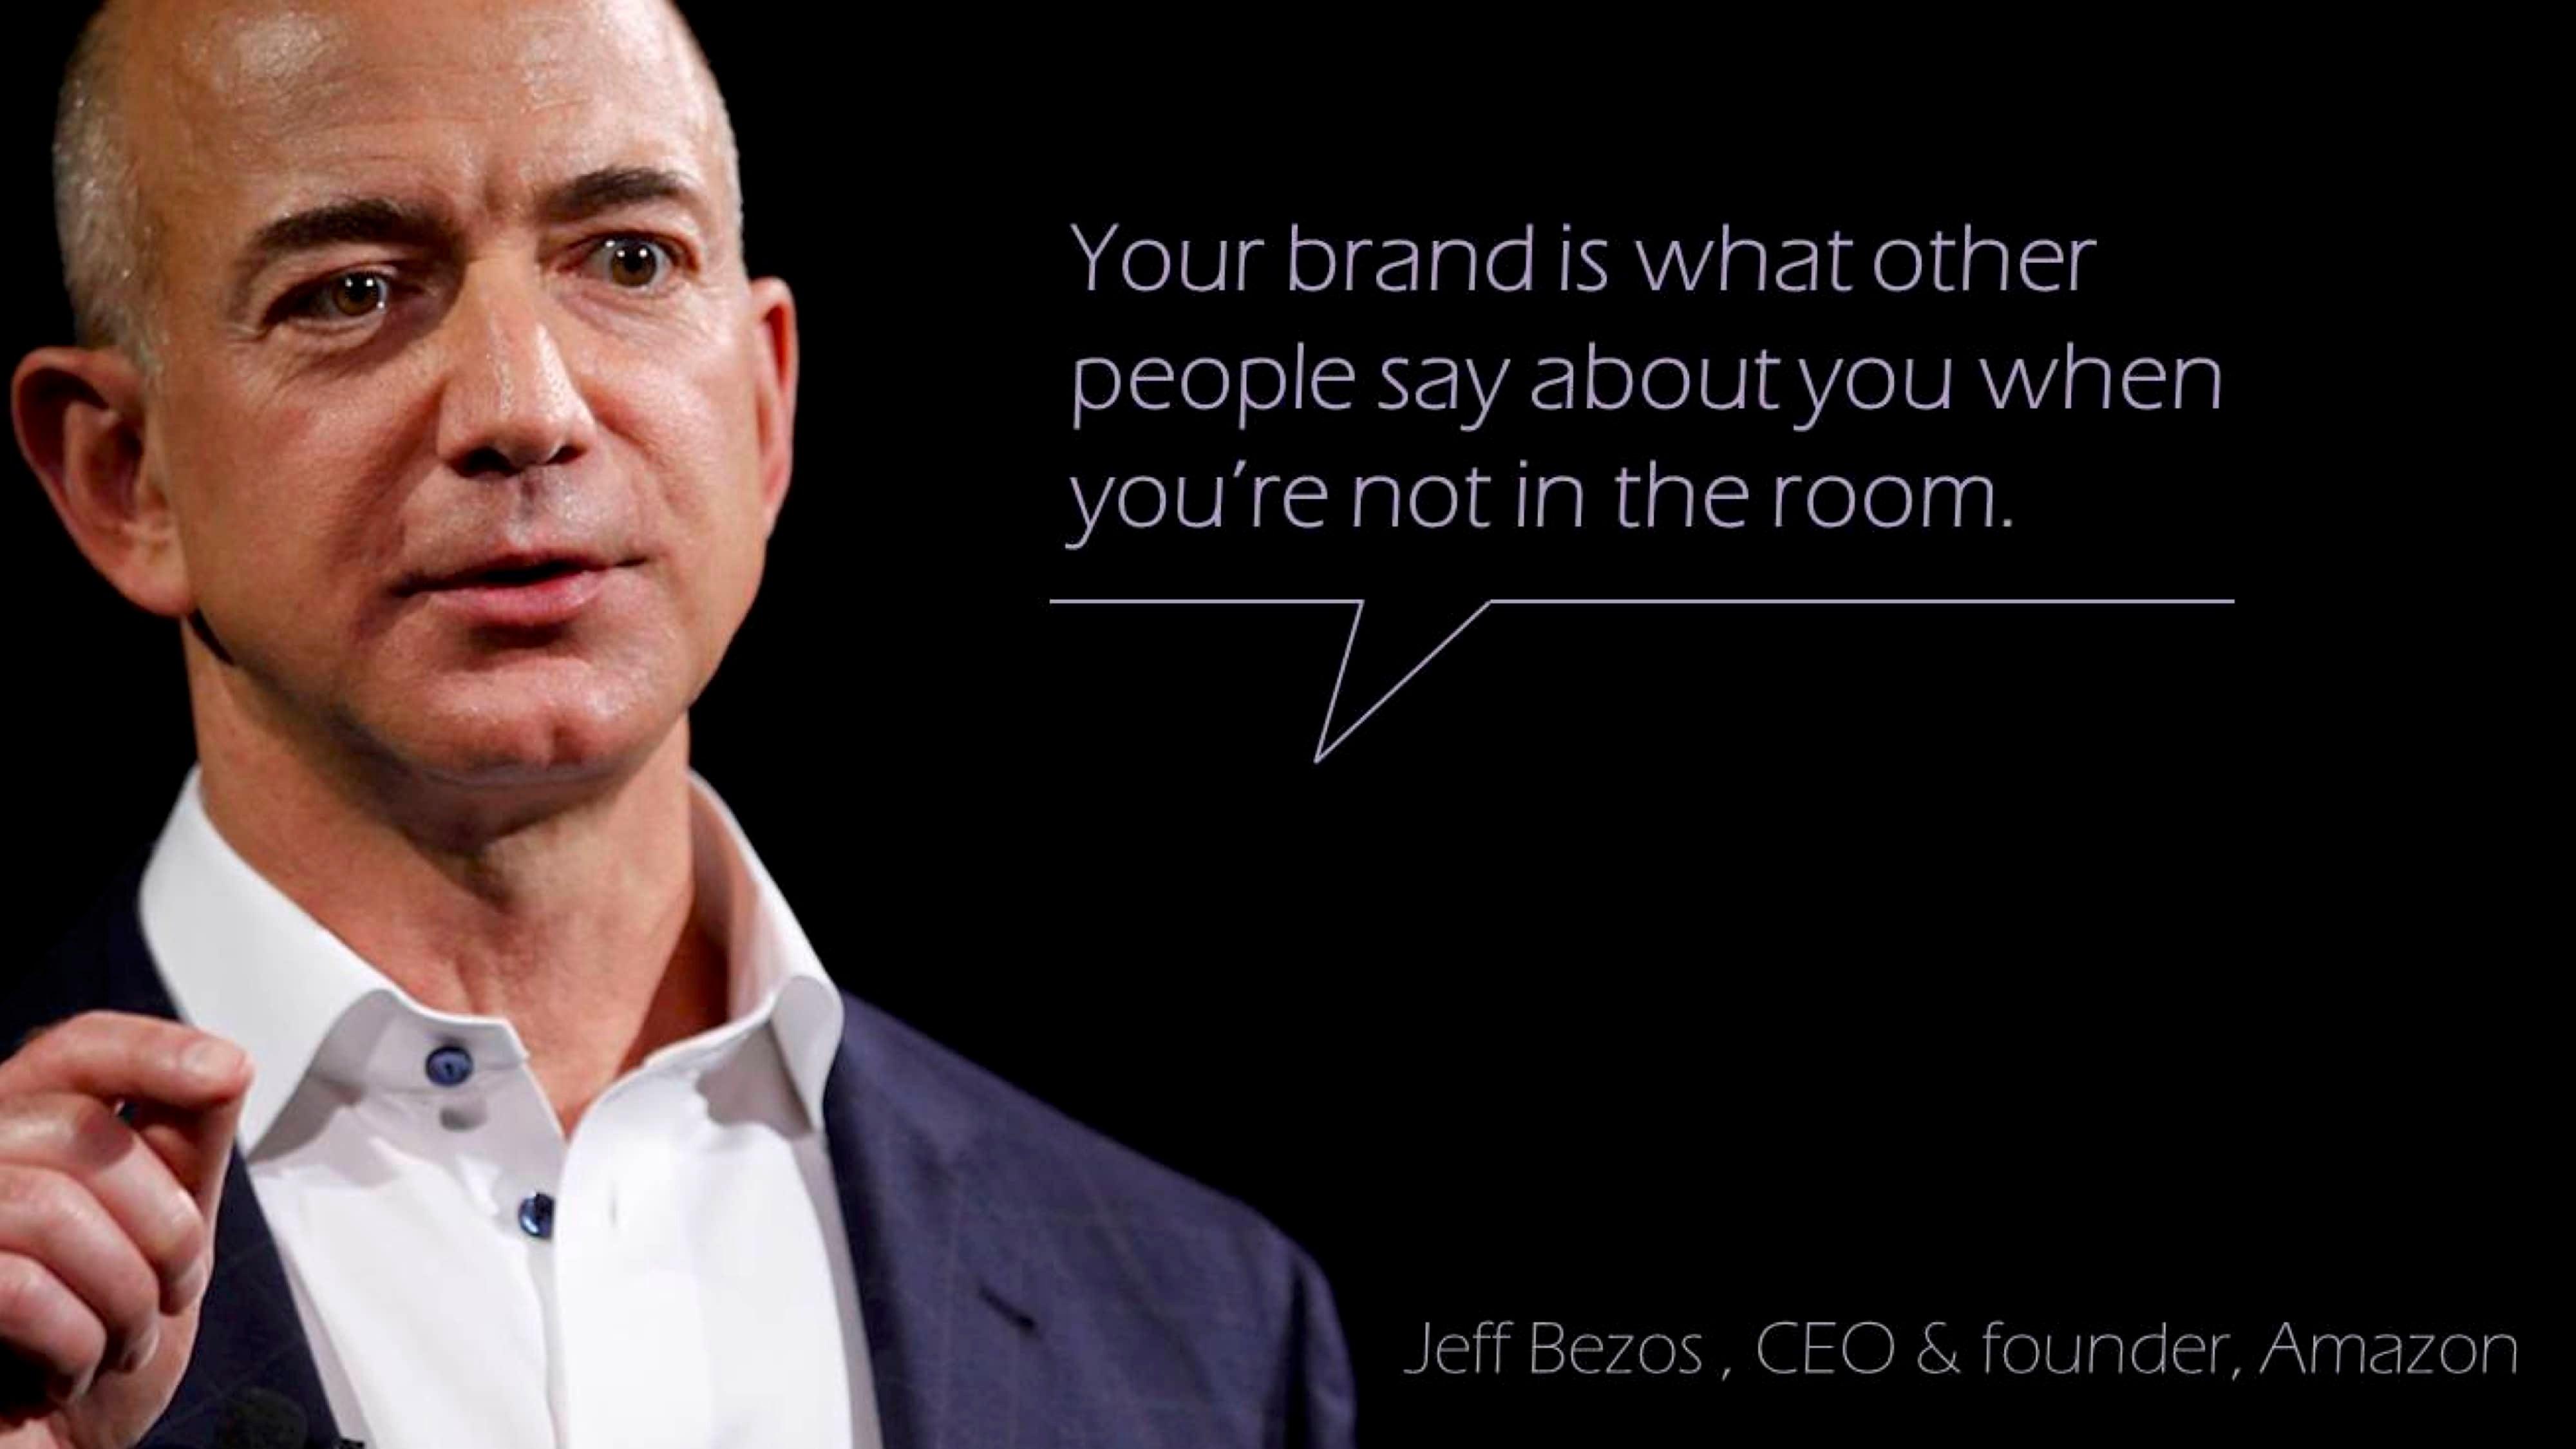 Jeff Bezos Brand